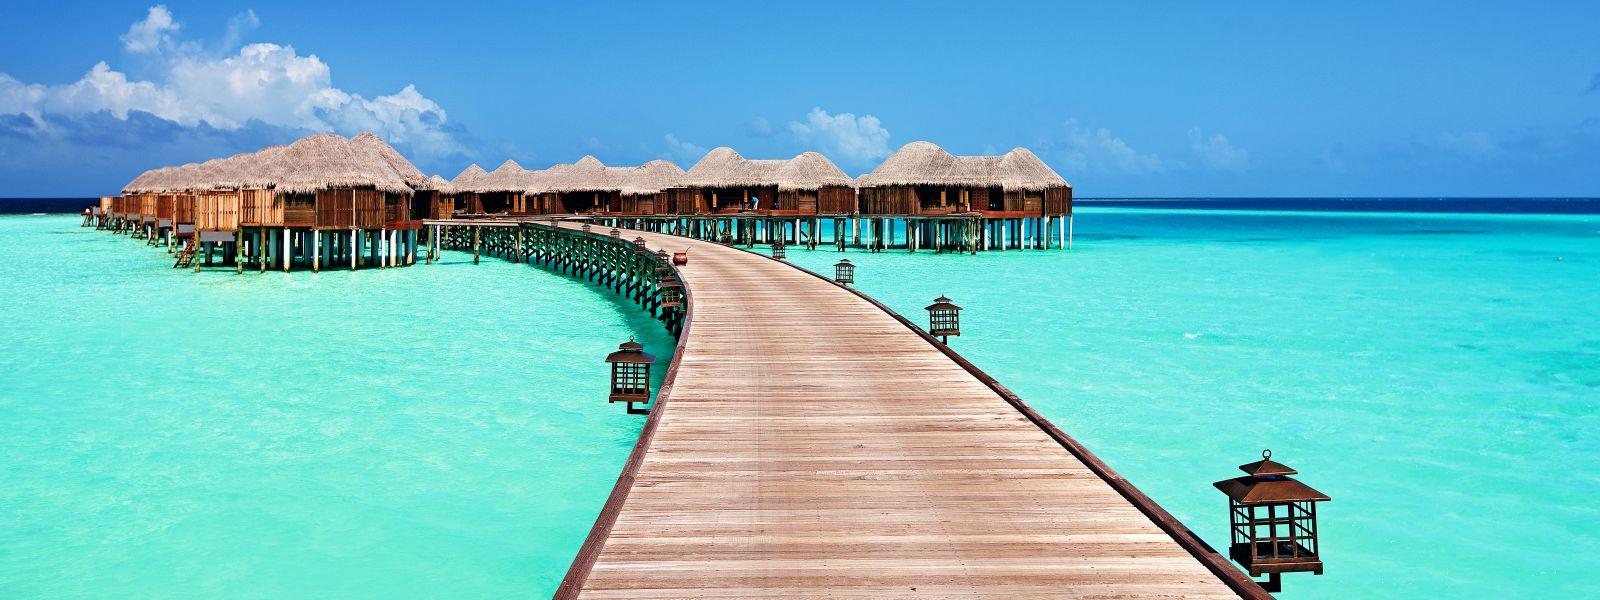 Malediveninsel Halaveli